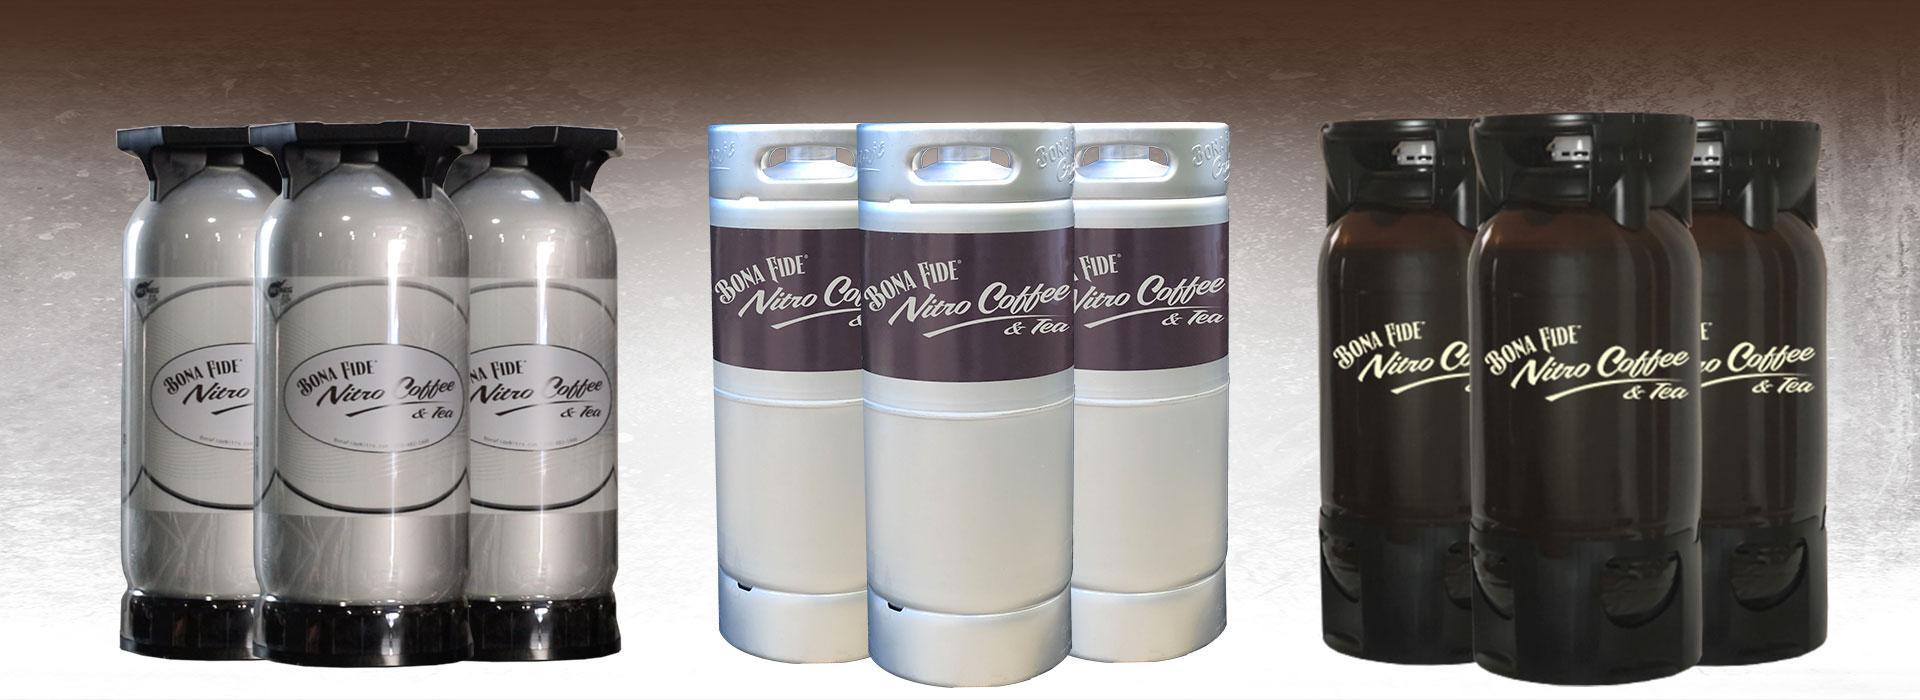 Bona Fide Nitro Coffee and Nitro Tea PET Keg, Stainless Steel Keg, Key Keg